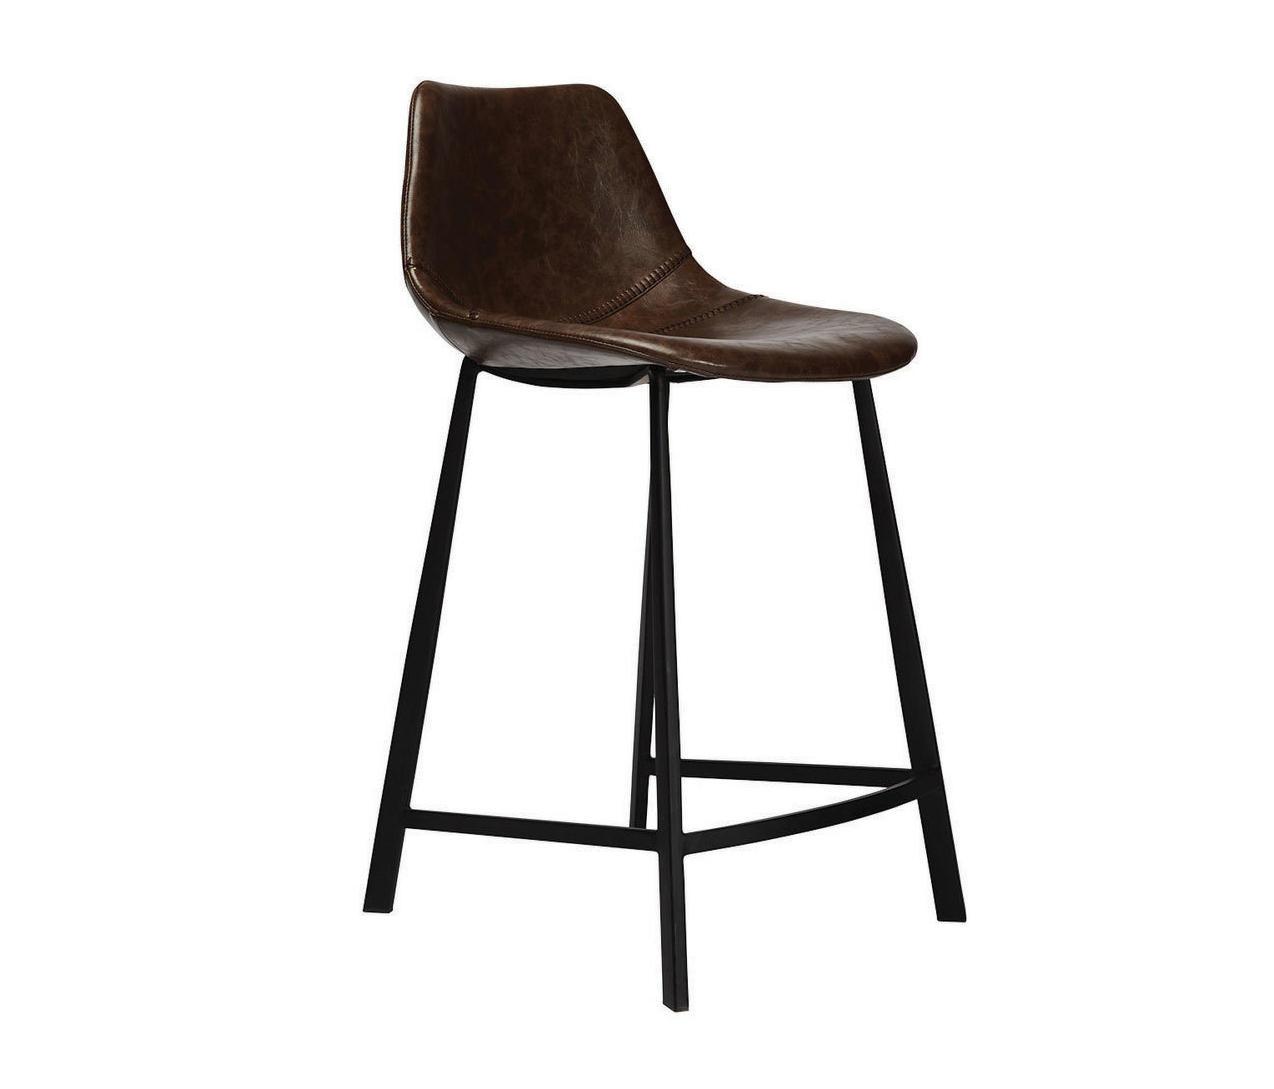 Peralta bar stool barhocker von pfeifer studio architonic for Barhocker englisch